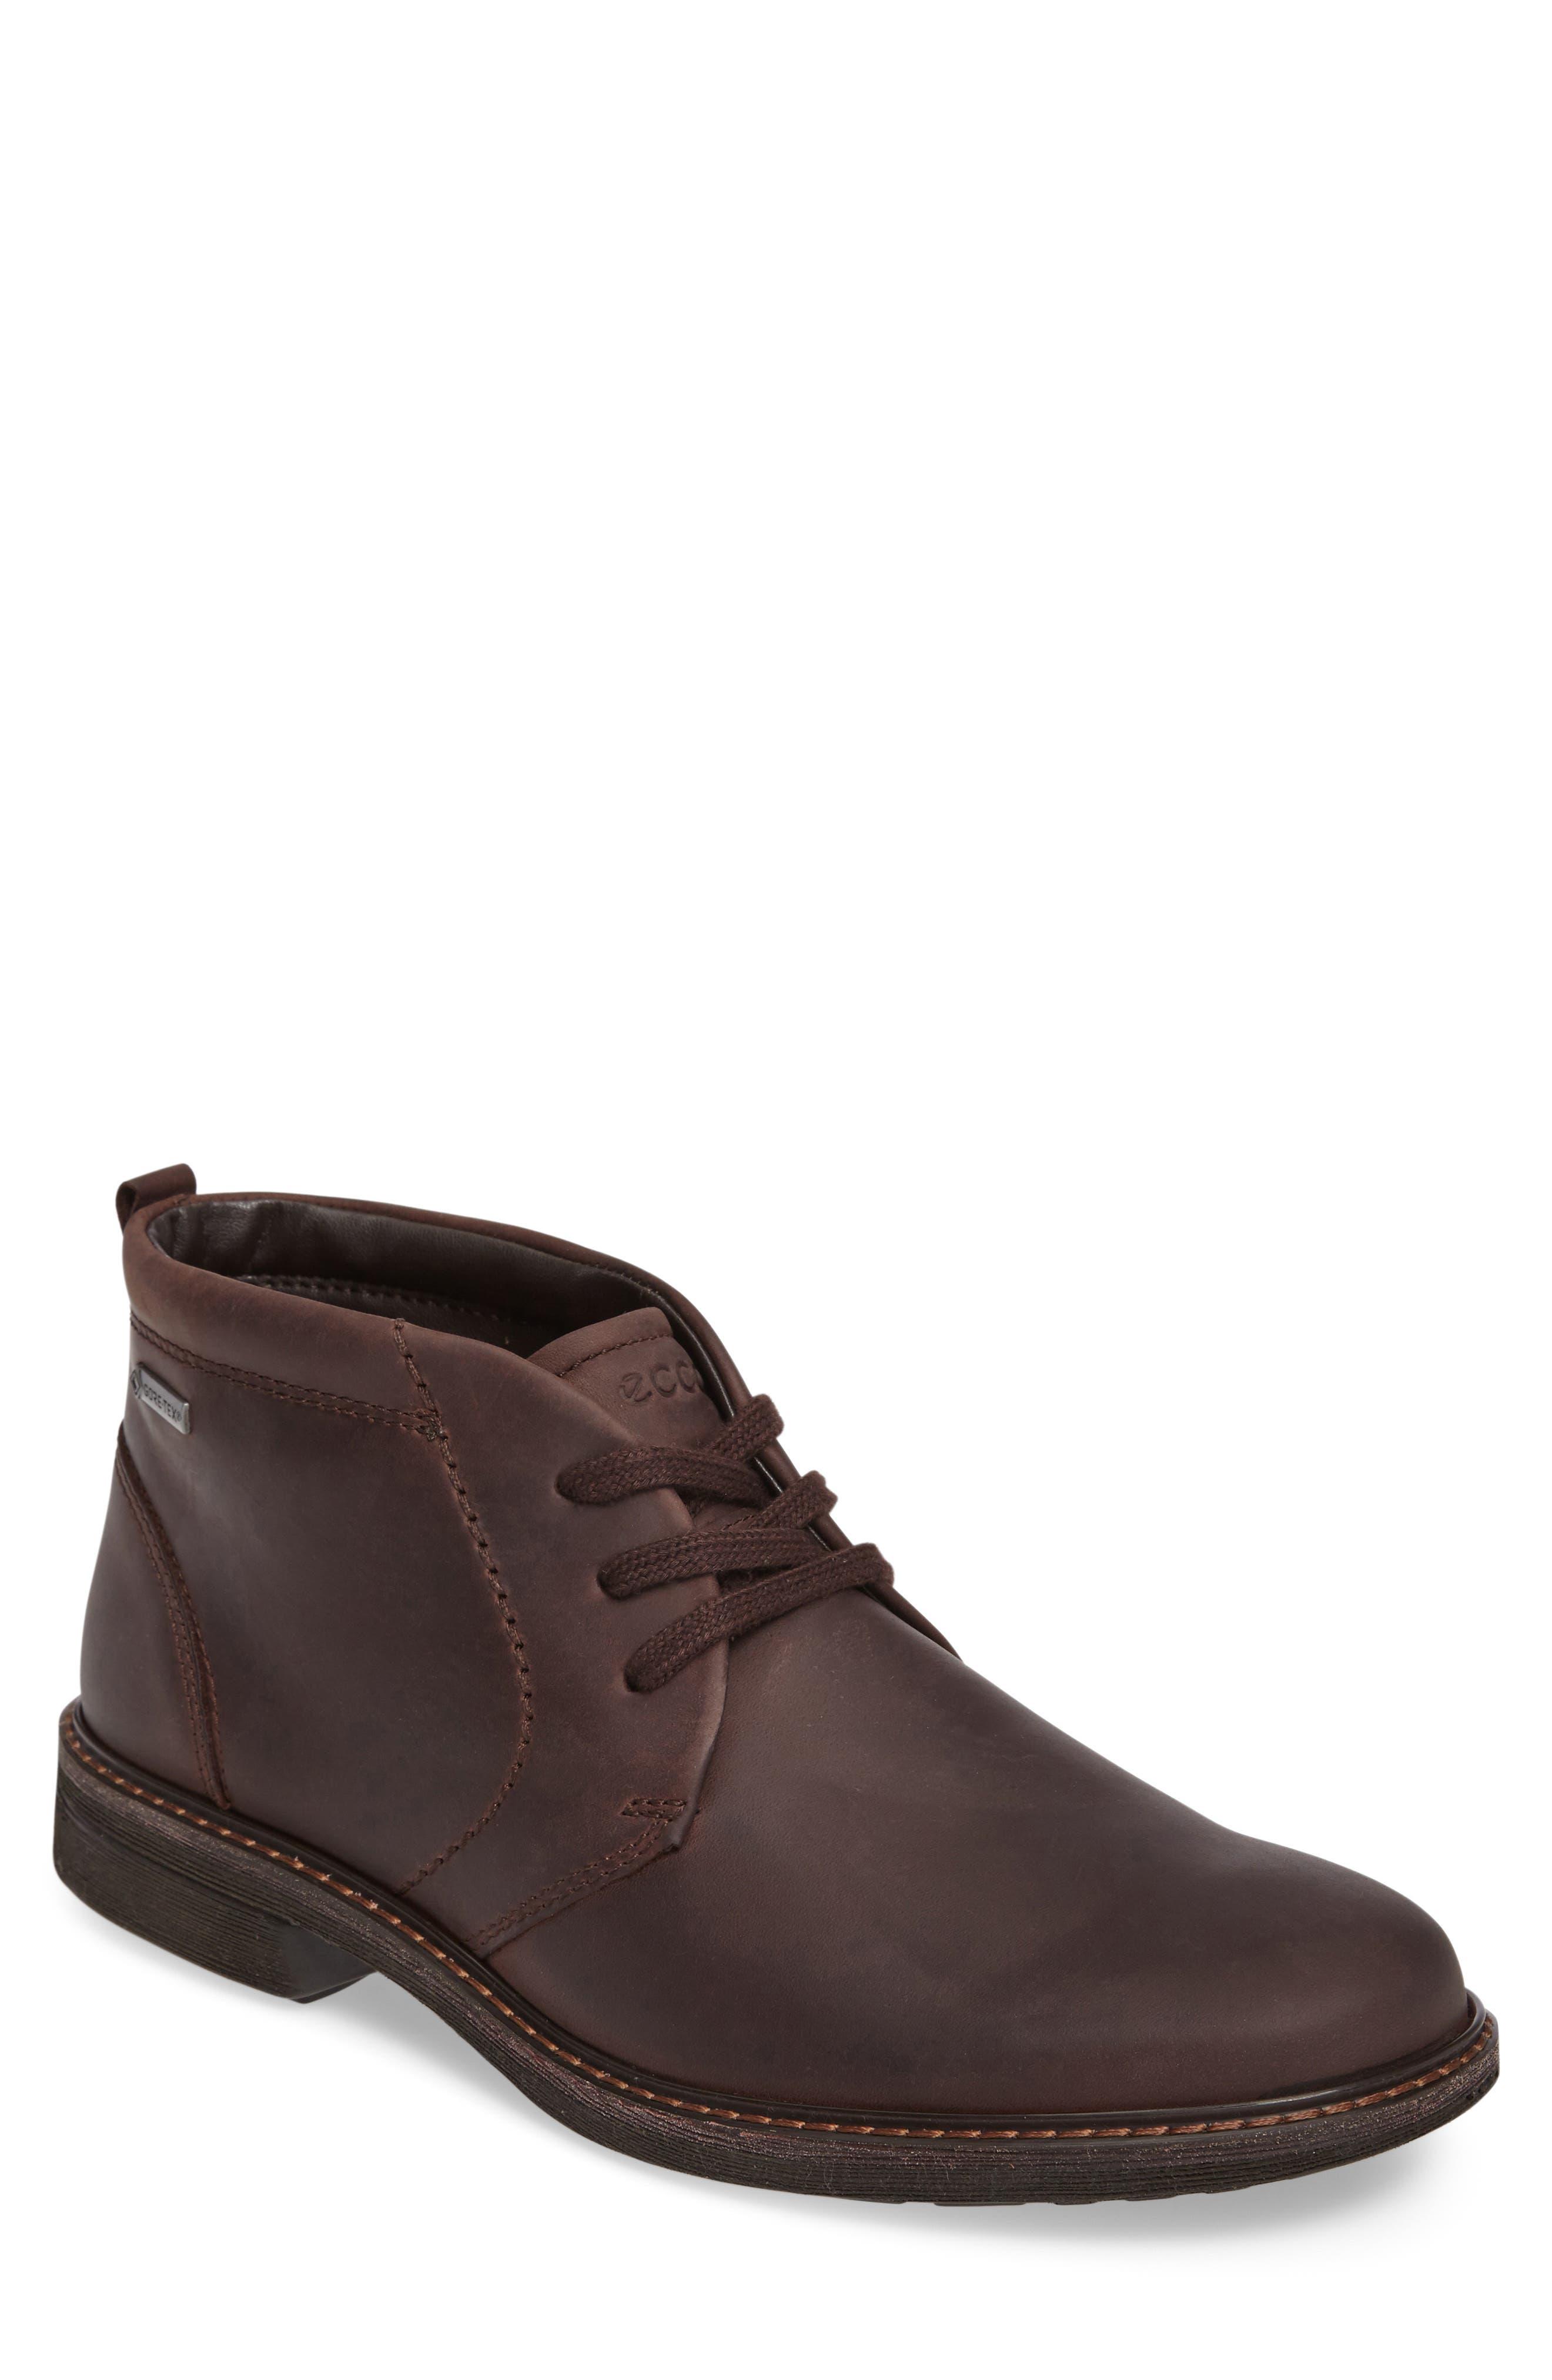 Turn Gore-Tex<sup>®</sup> Waterproof Chukka Boot,                             Main thumbnail 1, color,                             Mocha Nubuck Leather